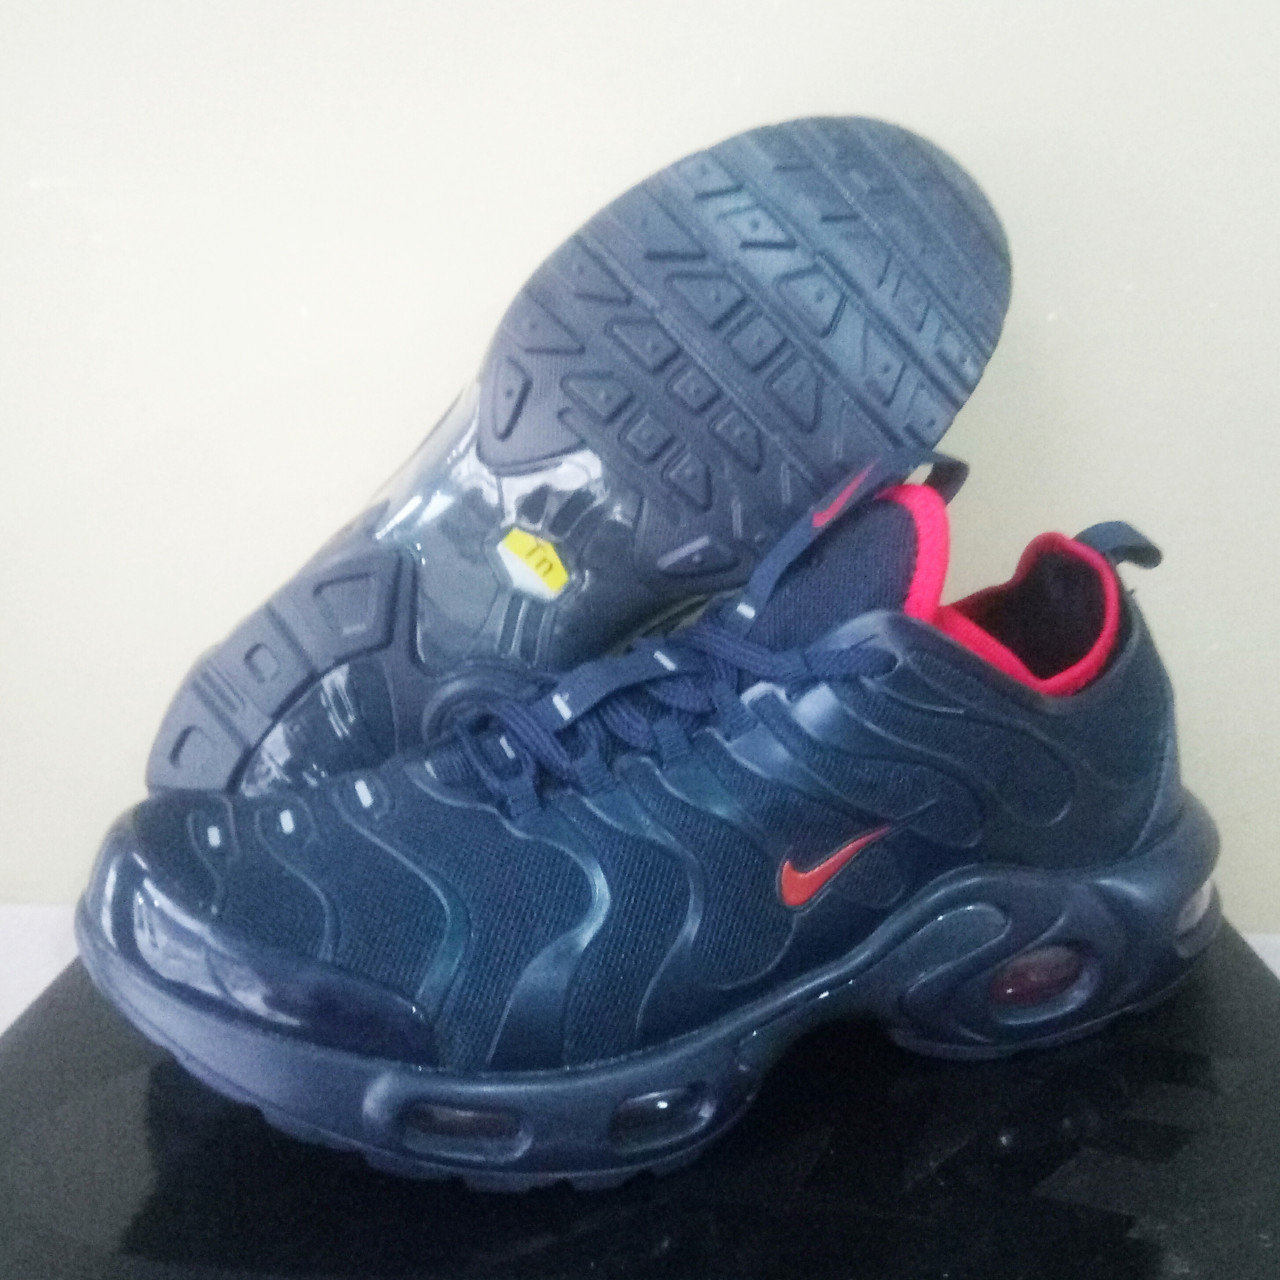 cd478dfe Кроссовки мужские Nike Air Max TN Plus Navy/Red (в стиле Найк) 44 ...